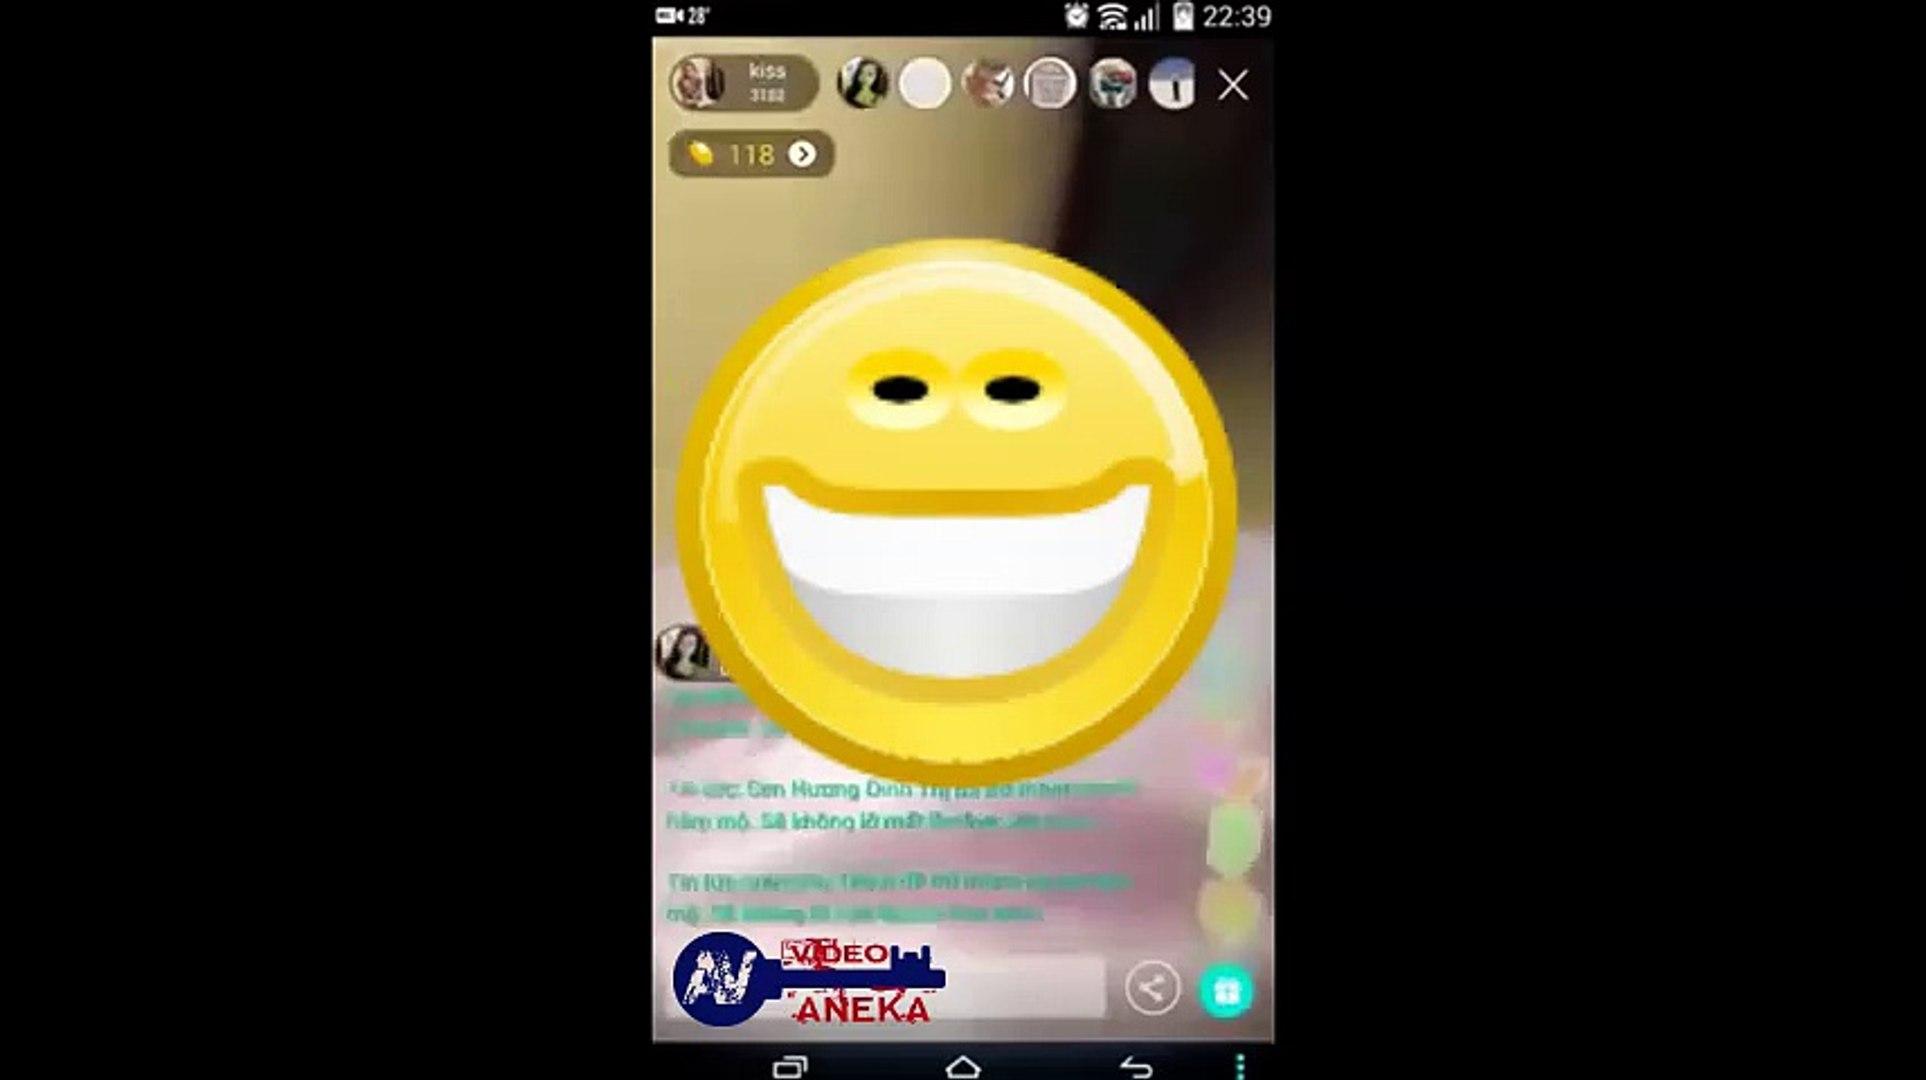 Aneka Video BIGO LIVE THAILAND Bigo LIVe Amerika Bigo LIVE Philipine Bigo Live WOW